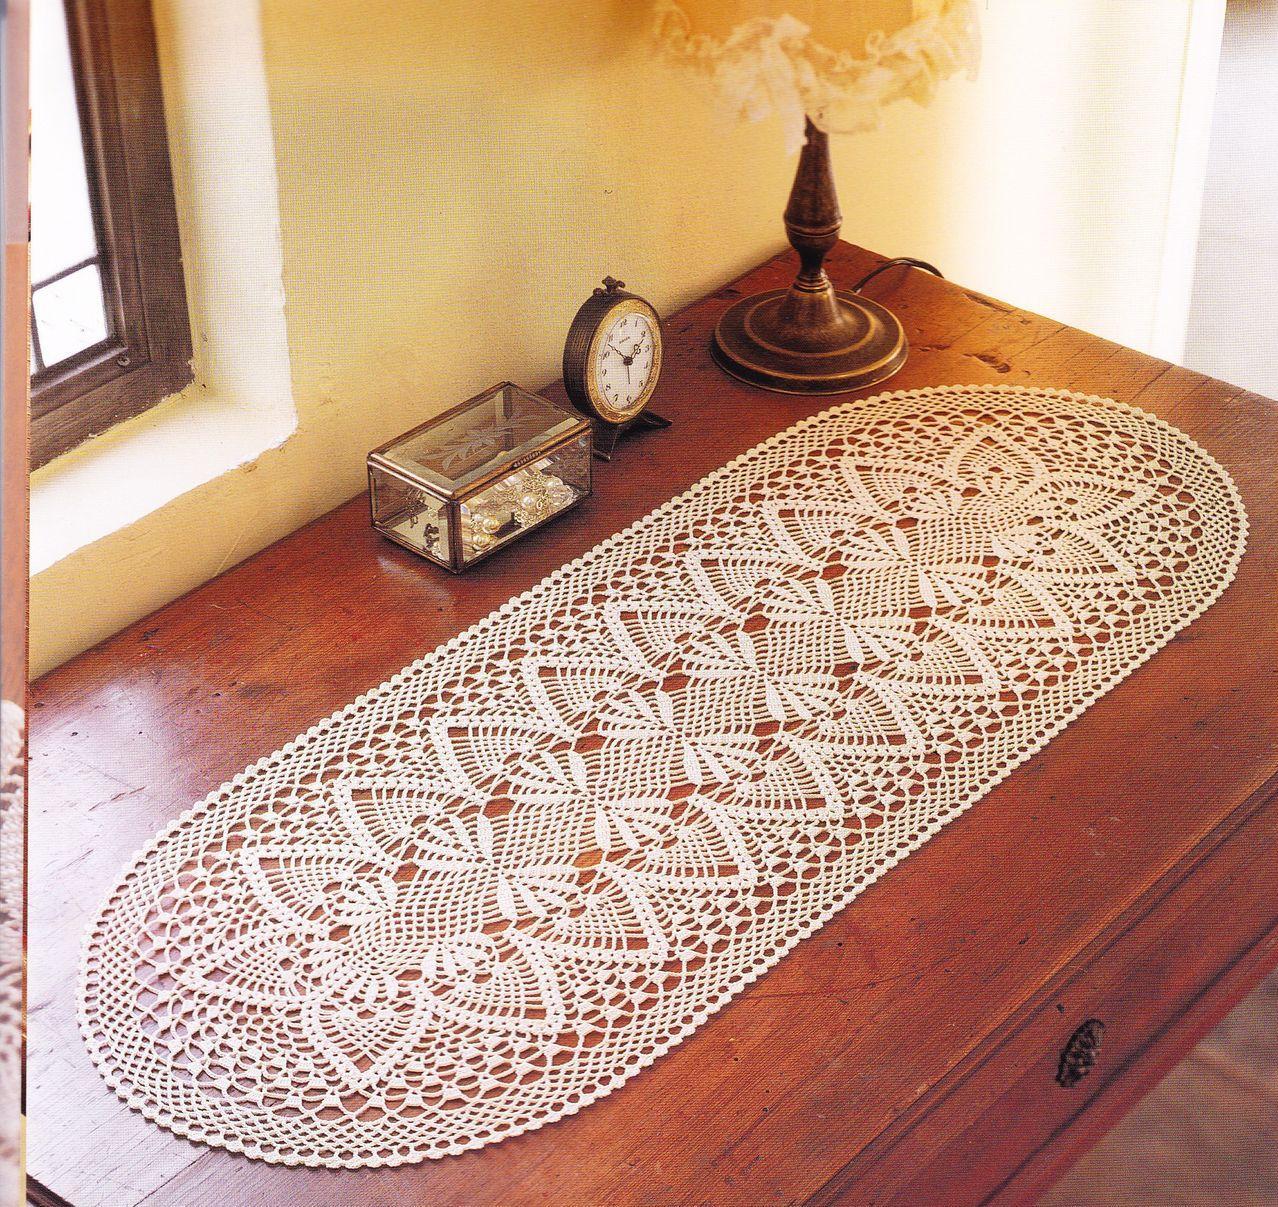 Etiquetas: crochet , crochet-camino de mesa